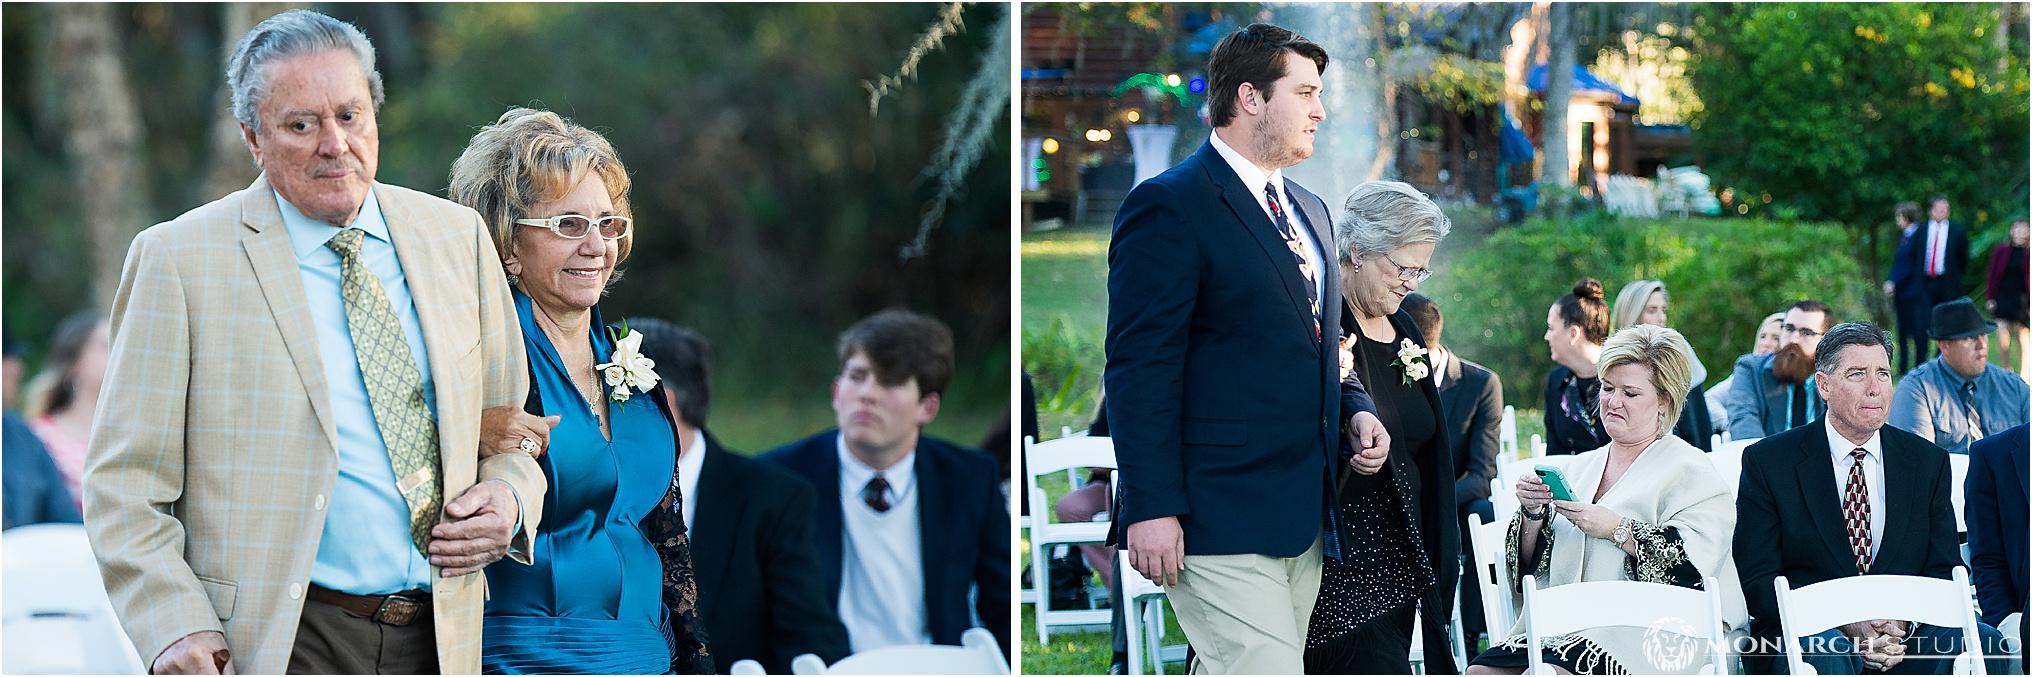 Wedding-photographer-in-sanford-florida-natural-wedding-031.jpg